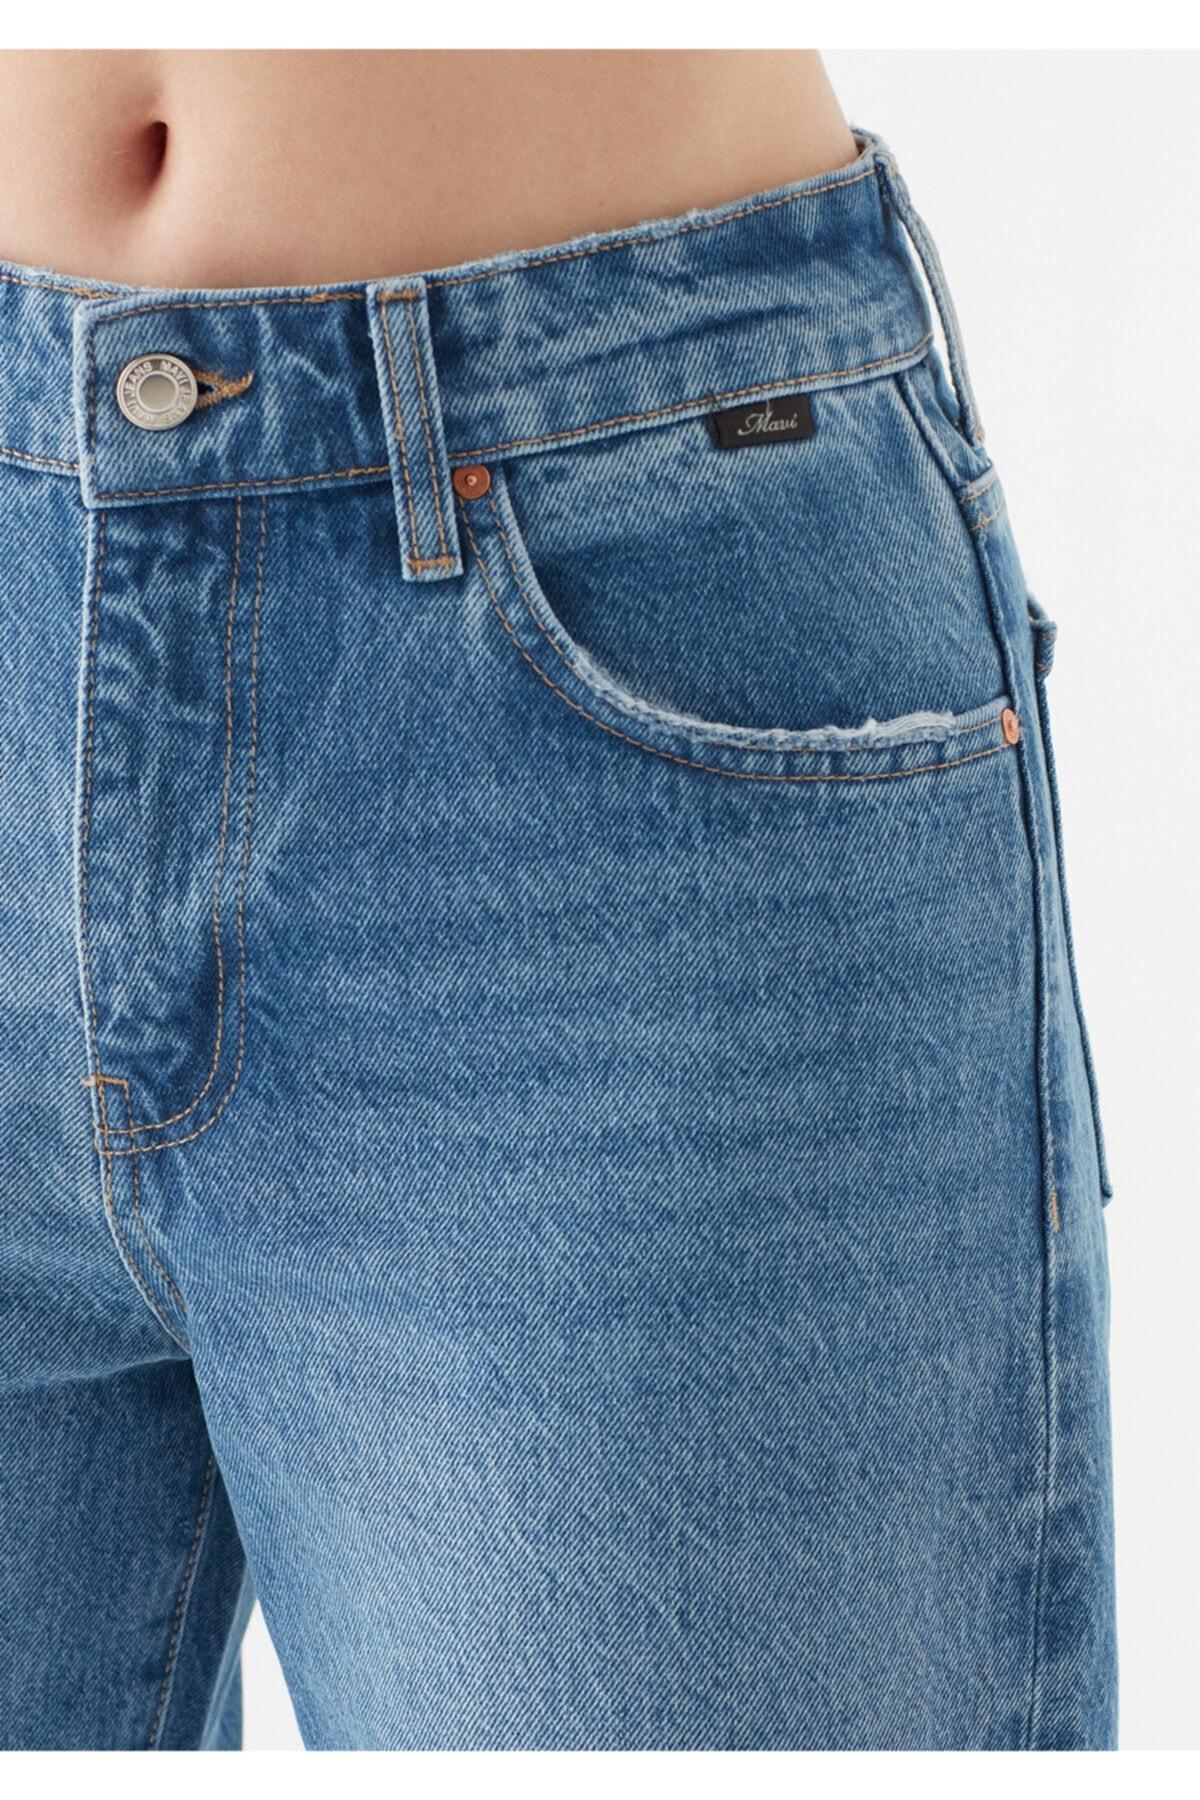 Mavi Barcelona All Blue Jean Pantolon